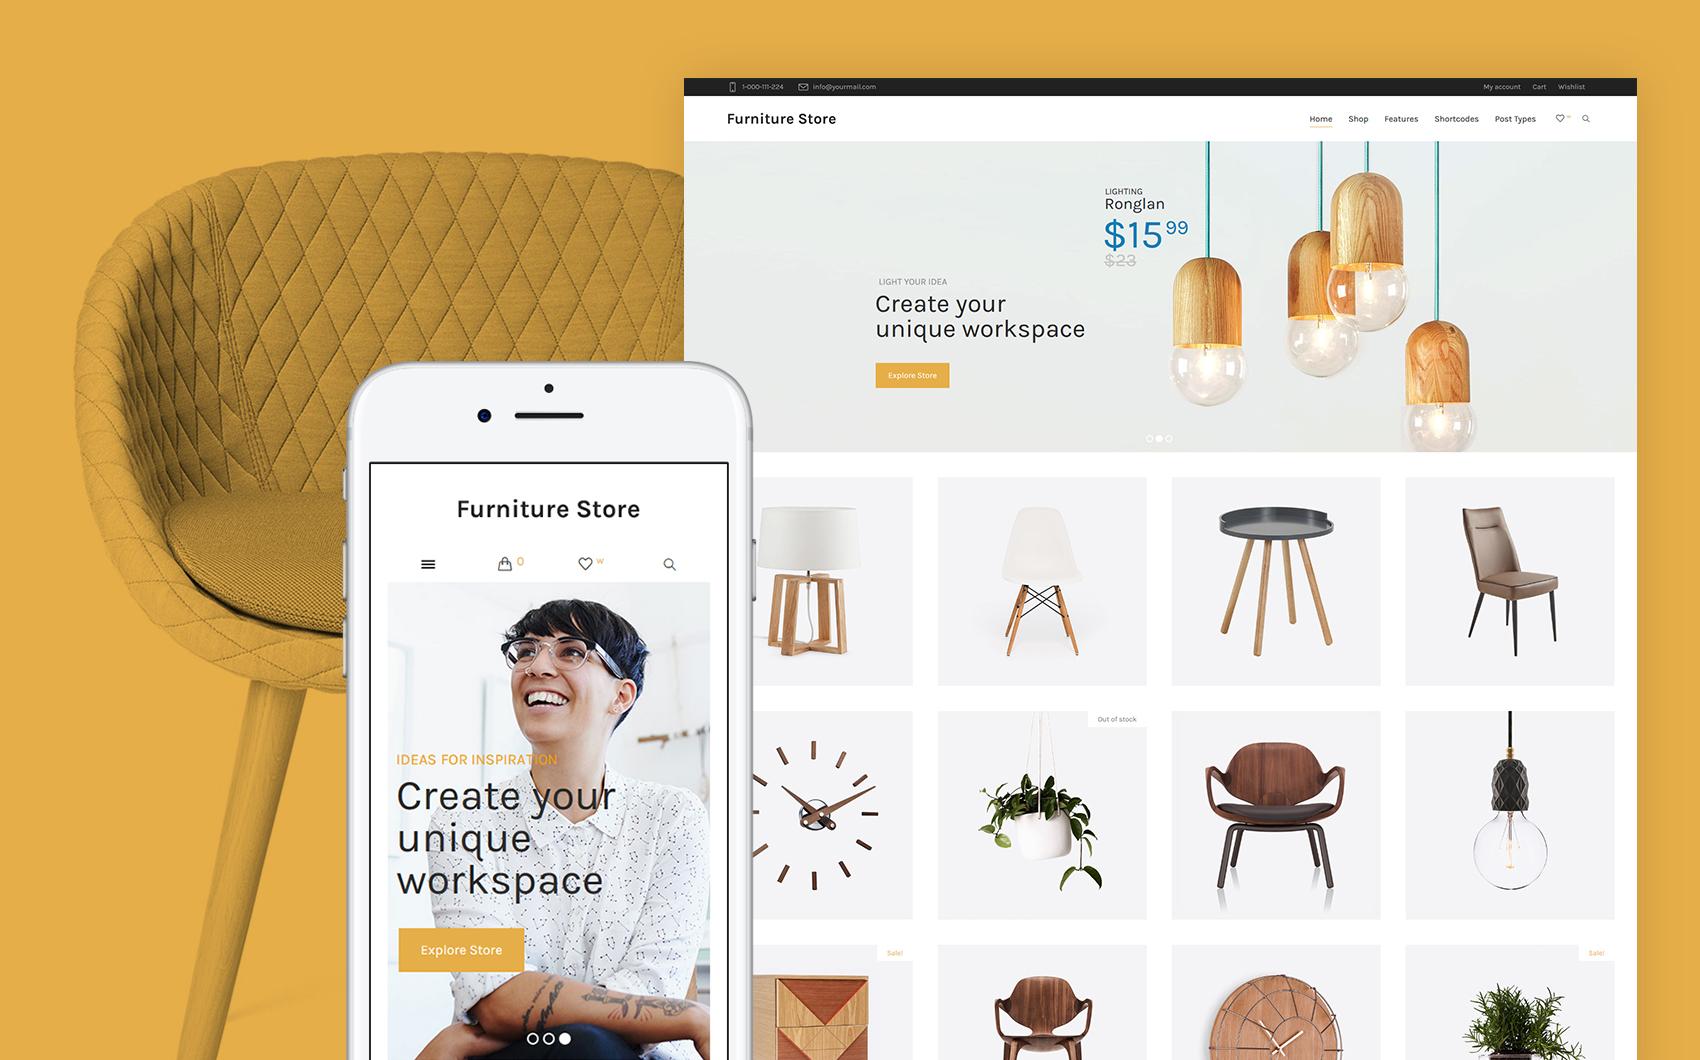 https://s3.tmimgcdn.com/templates/105/scr/furniture-store-slider-1.jpg